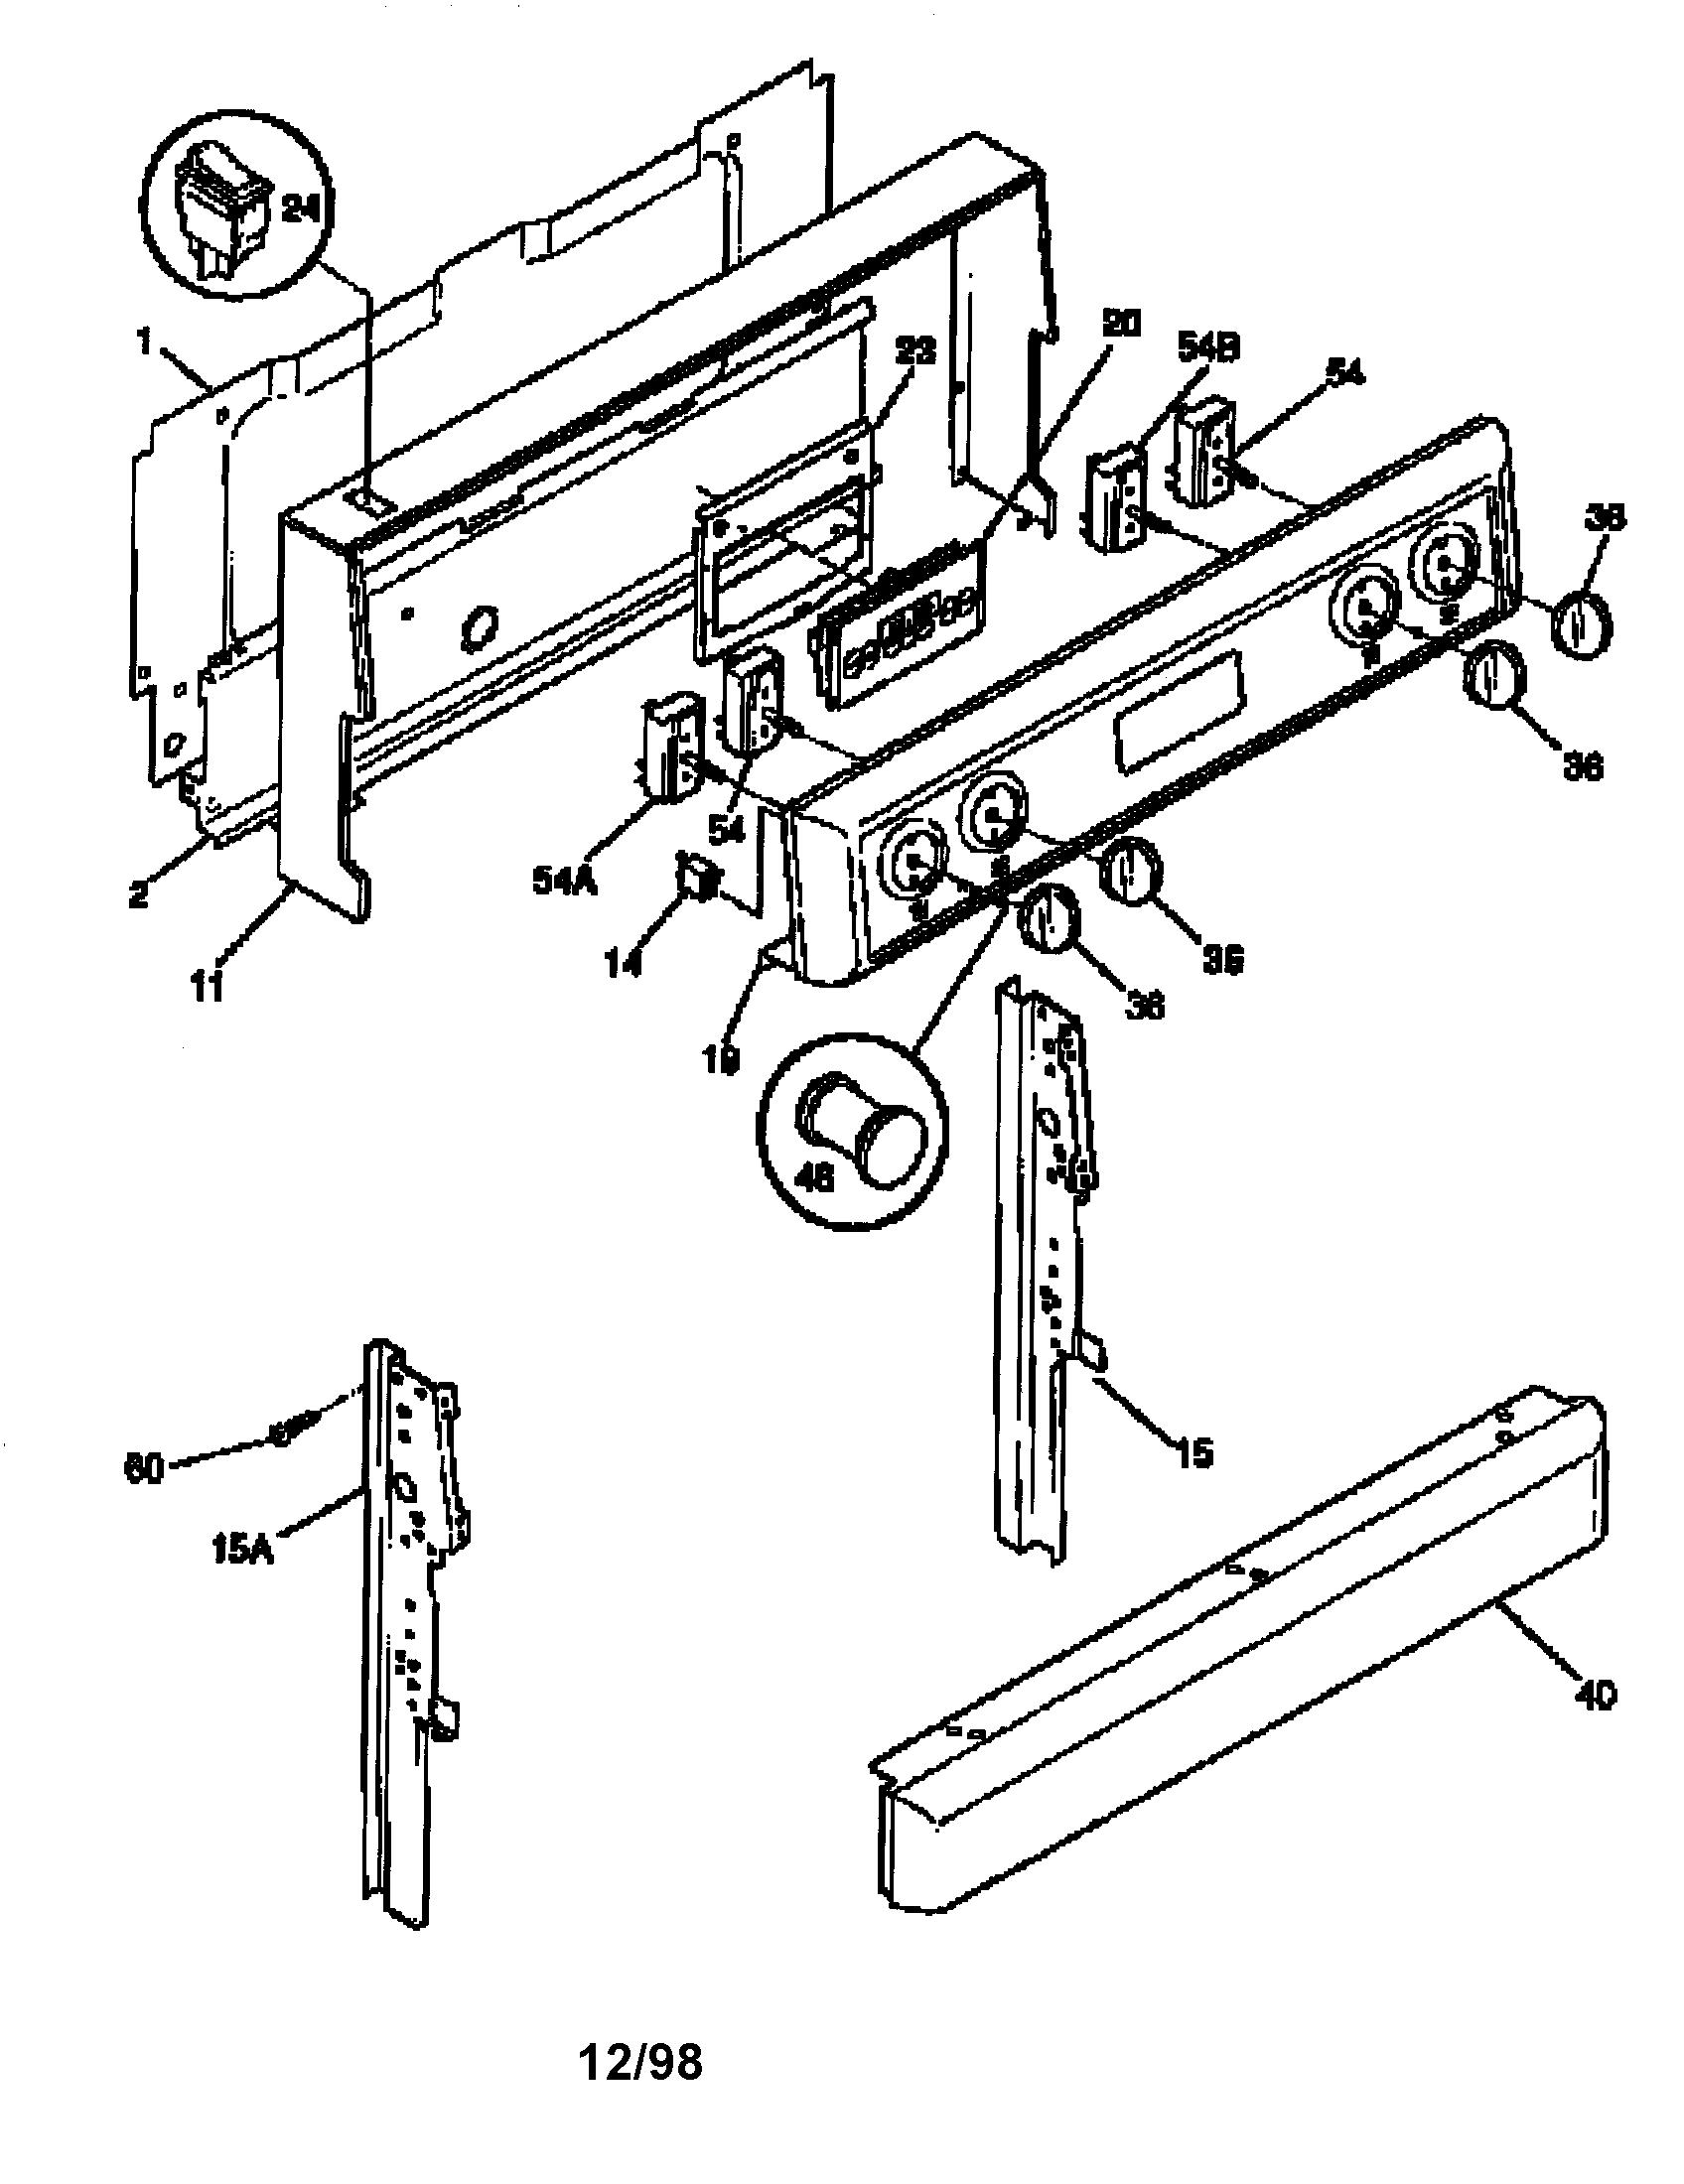 Frigidaire Fef367catb Electric Range Timer